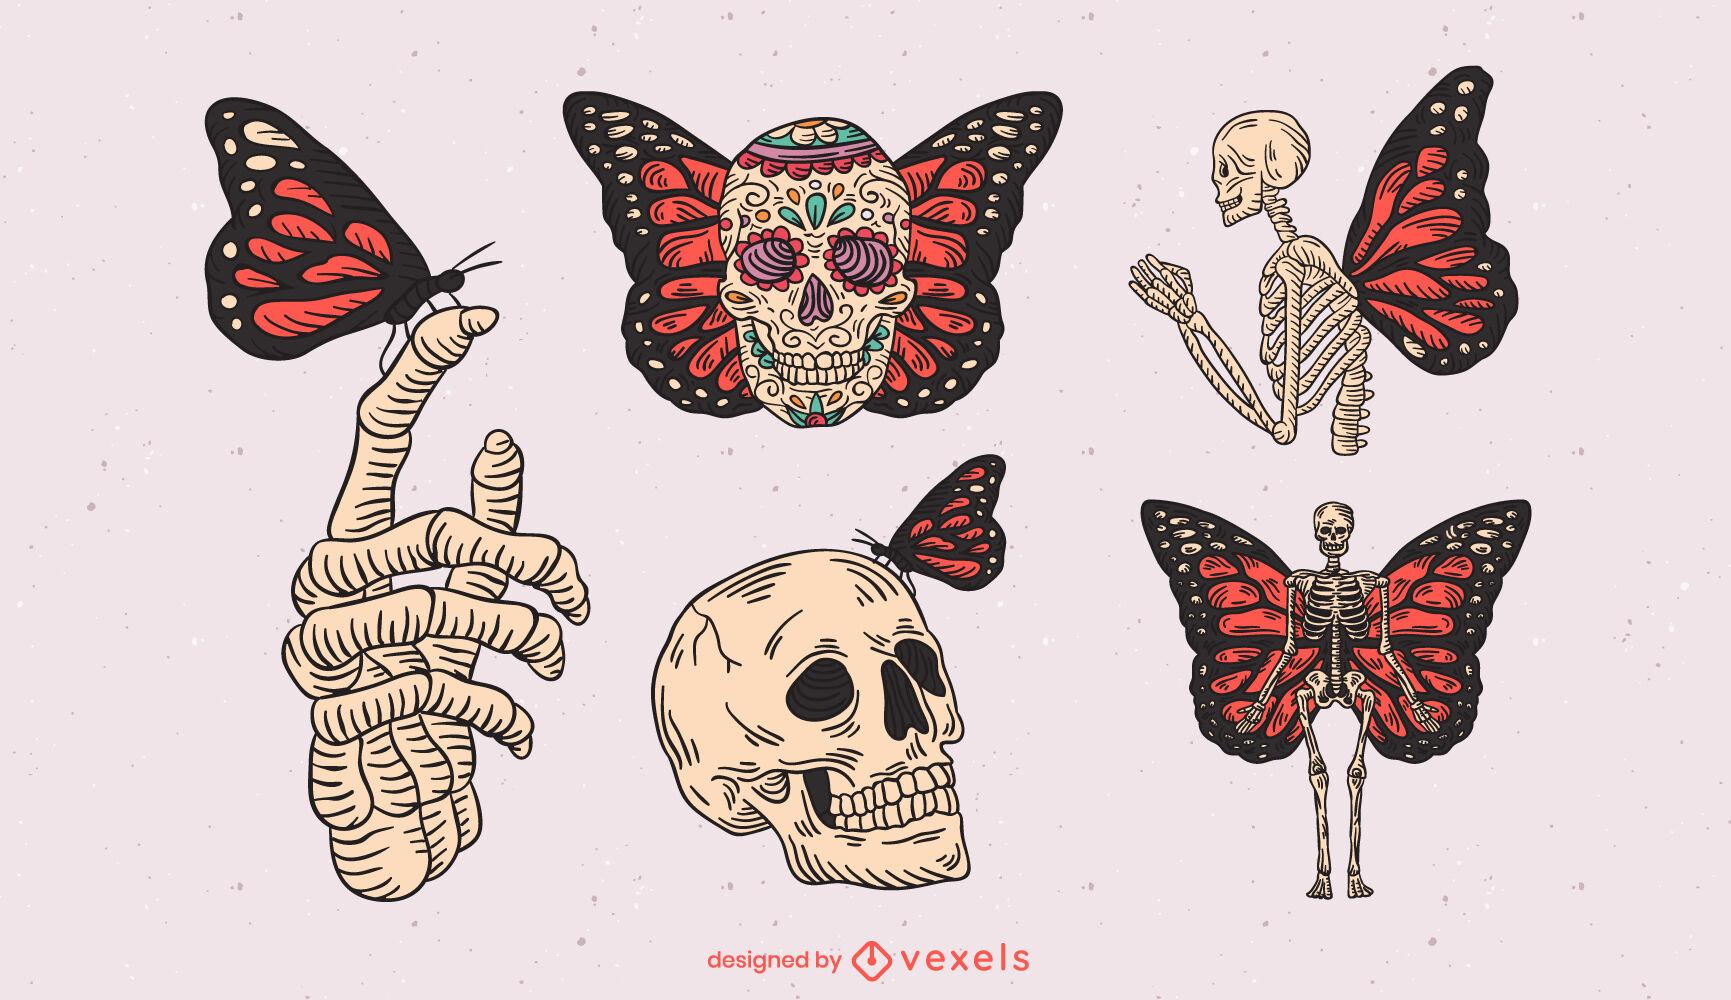 Skeletons and butterflies color stroke set